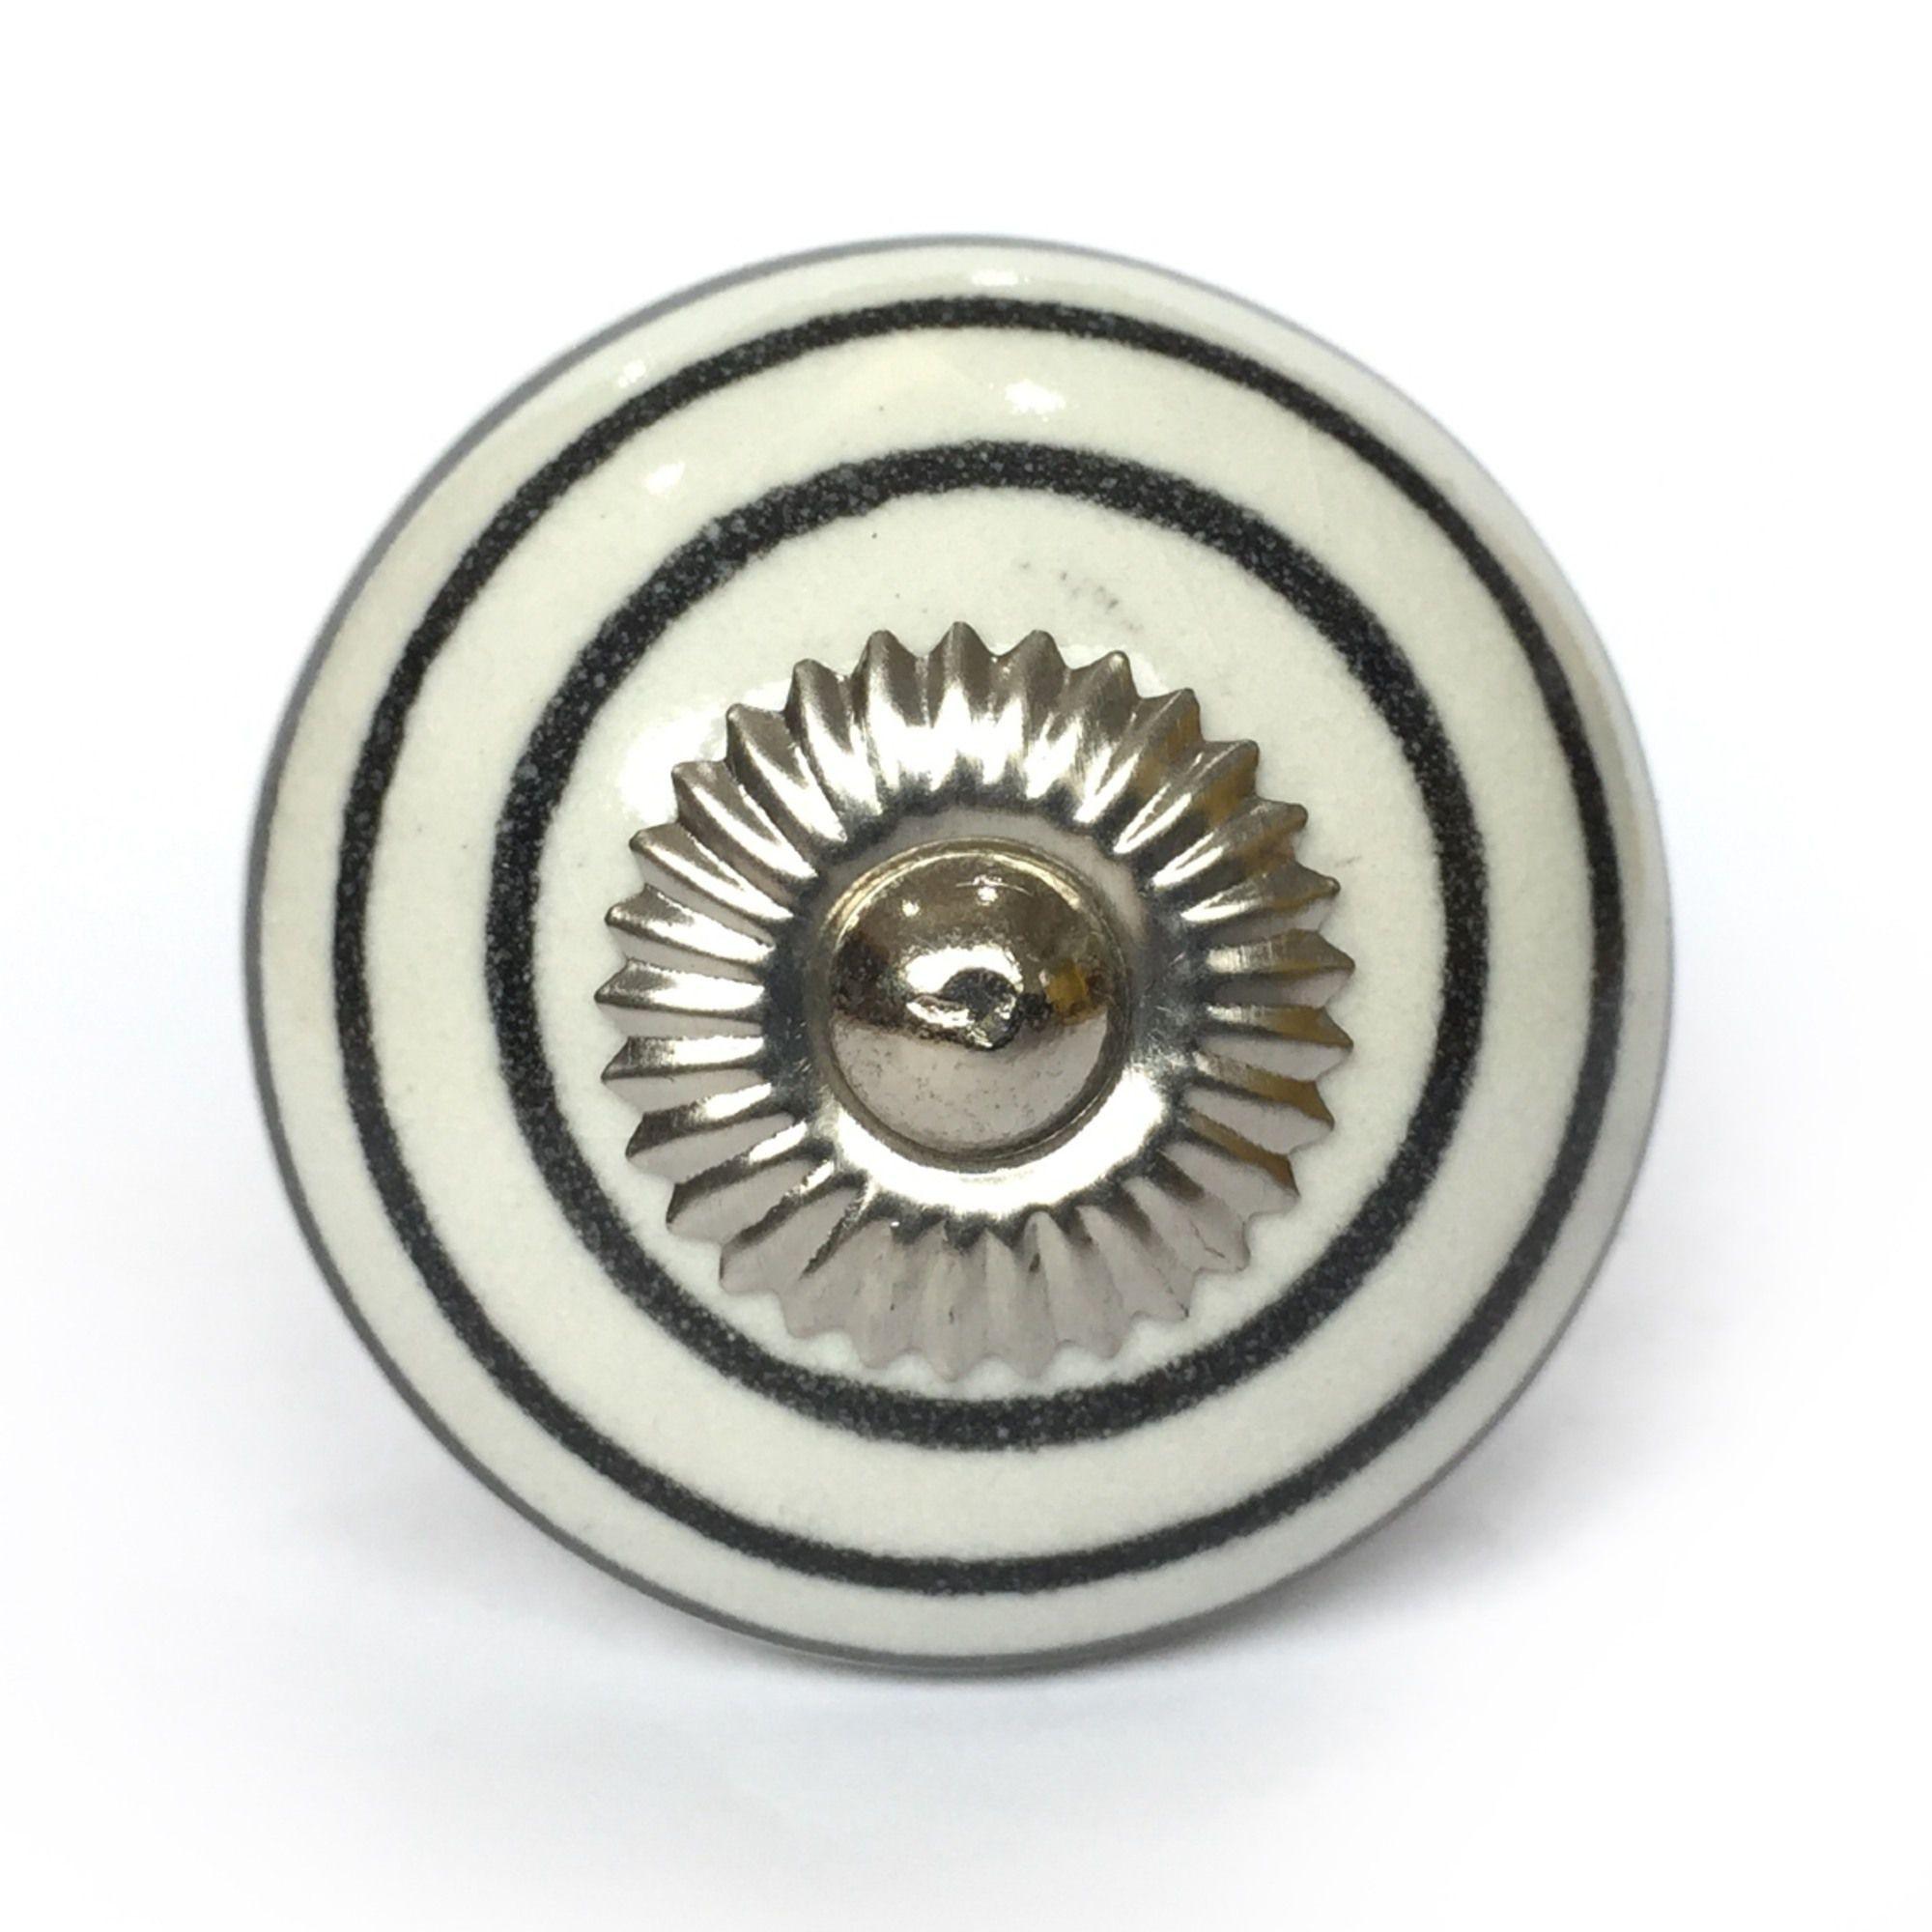 Puxador de Porcelana Target Preto e Branco - kit 4 pçs